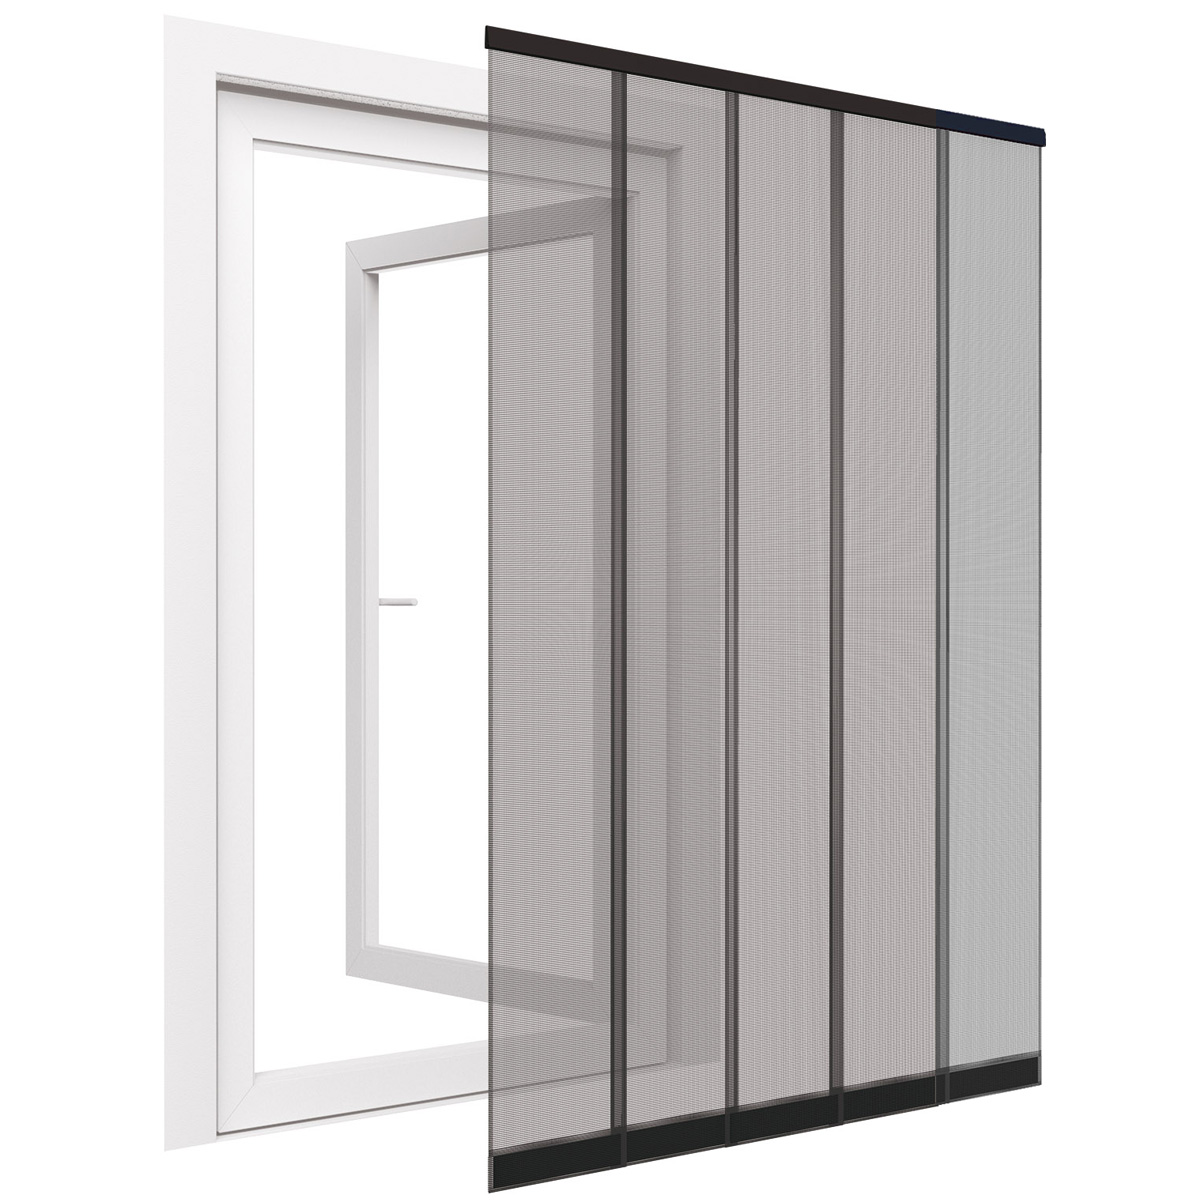 xxl insektenschutz t r vorhang 125x240cm fliegengitter lamellen fliegennetz ebay. Black Bedroom Furniture Sets. Home Design Ideas